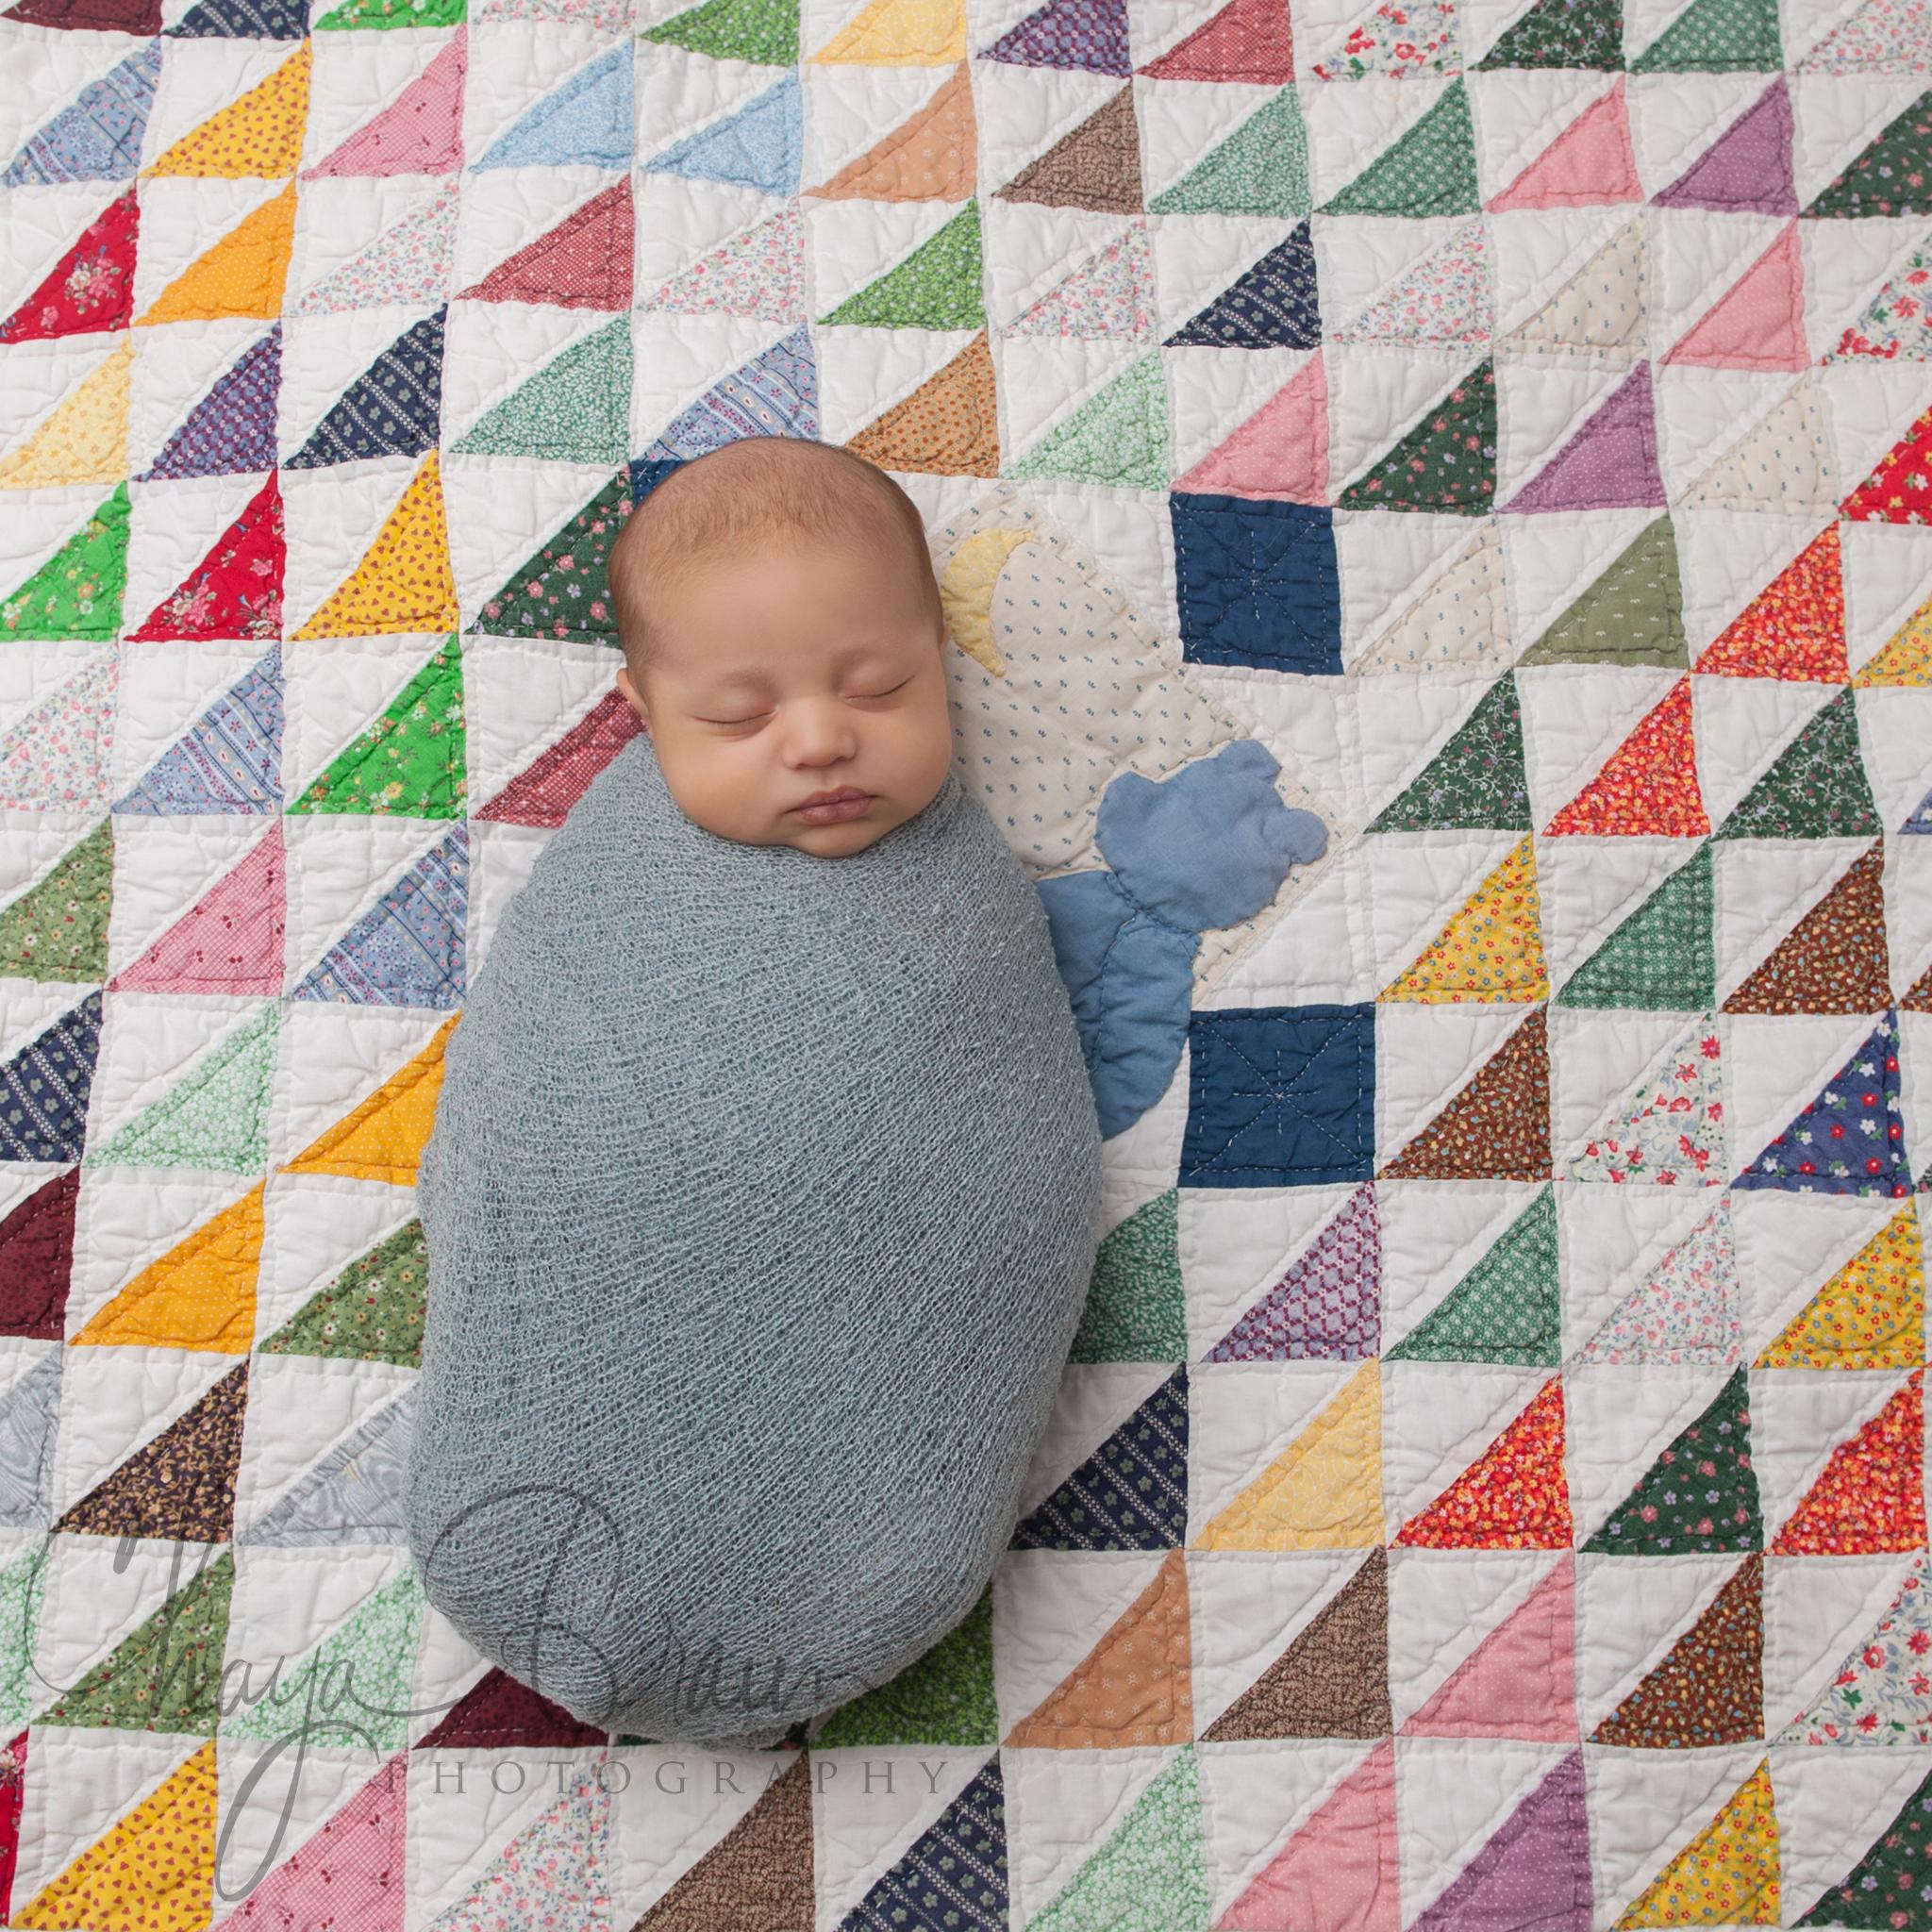 newborn baby boy on heirloom blanket